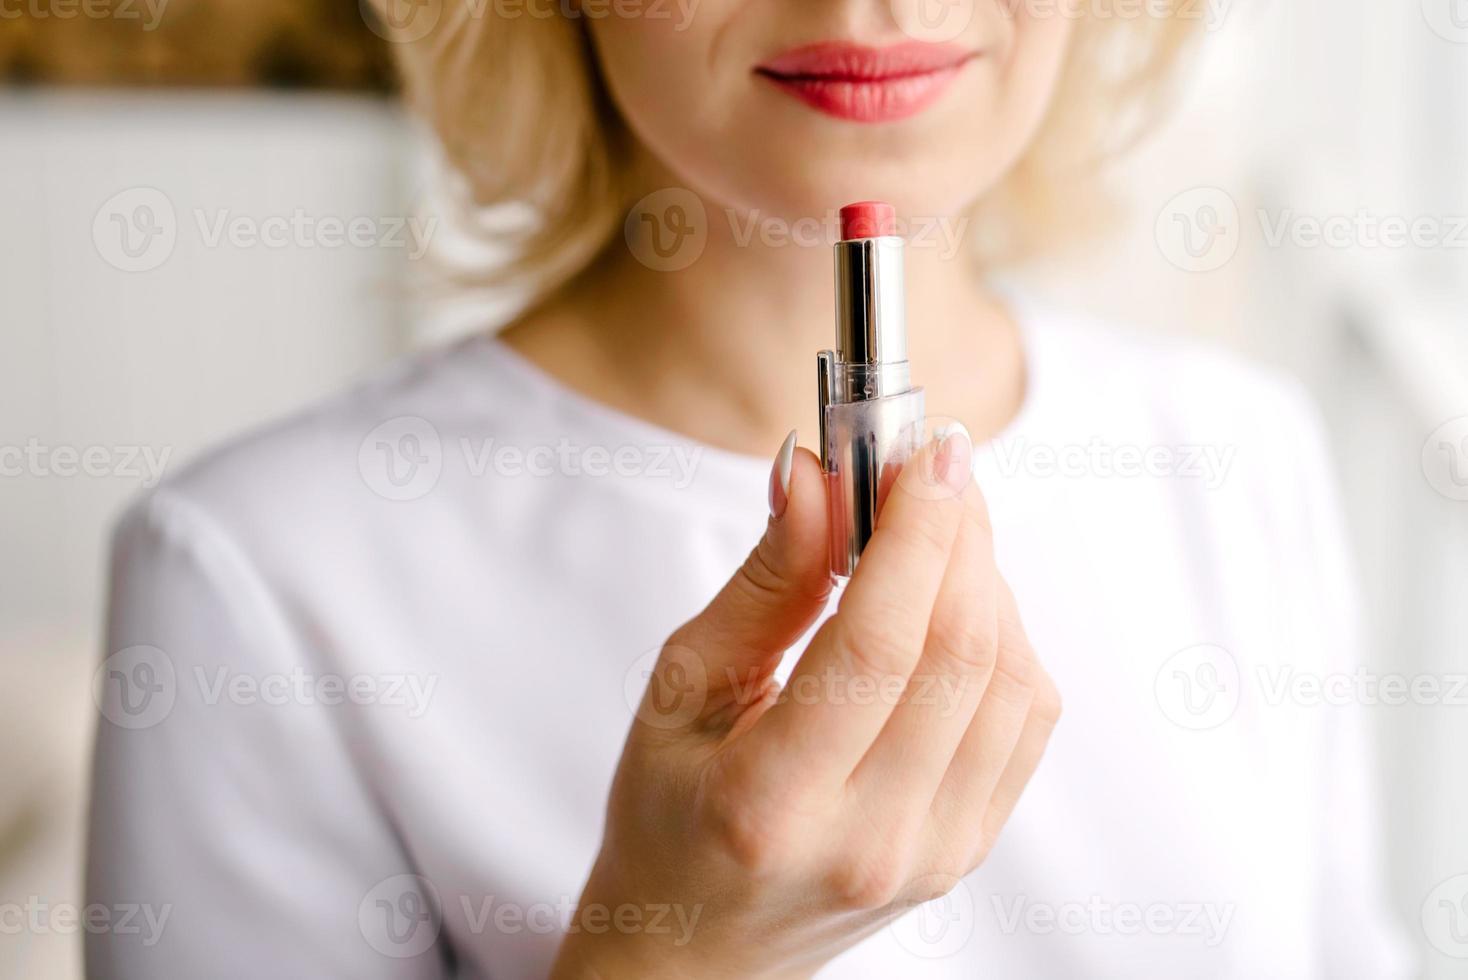 Lippenstift zum Malen der Lippen foto